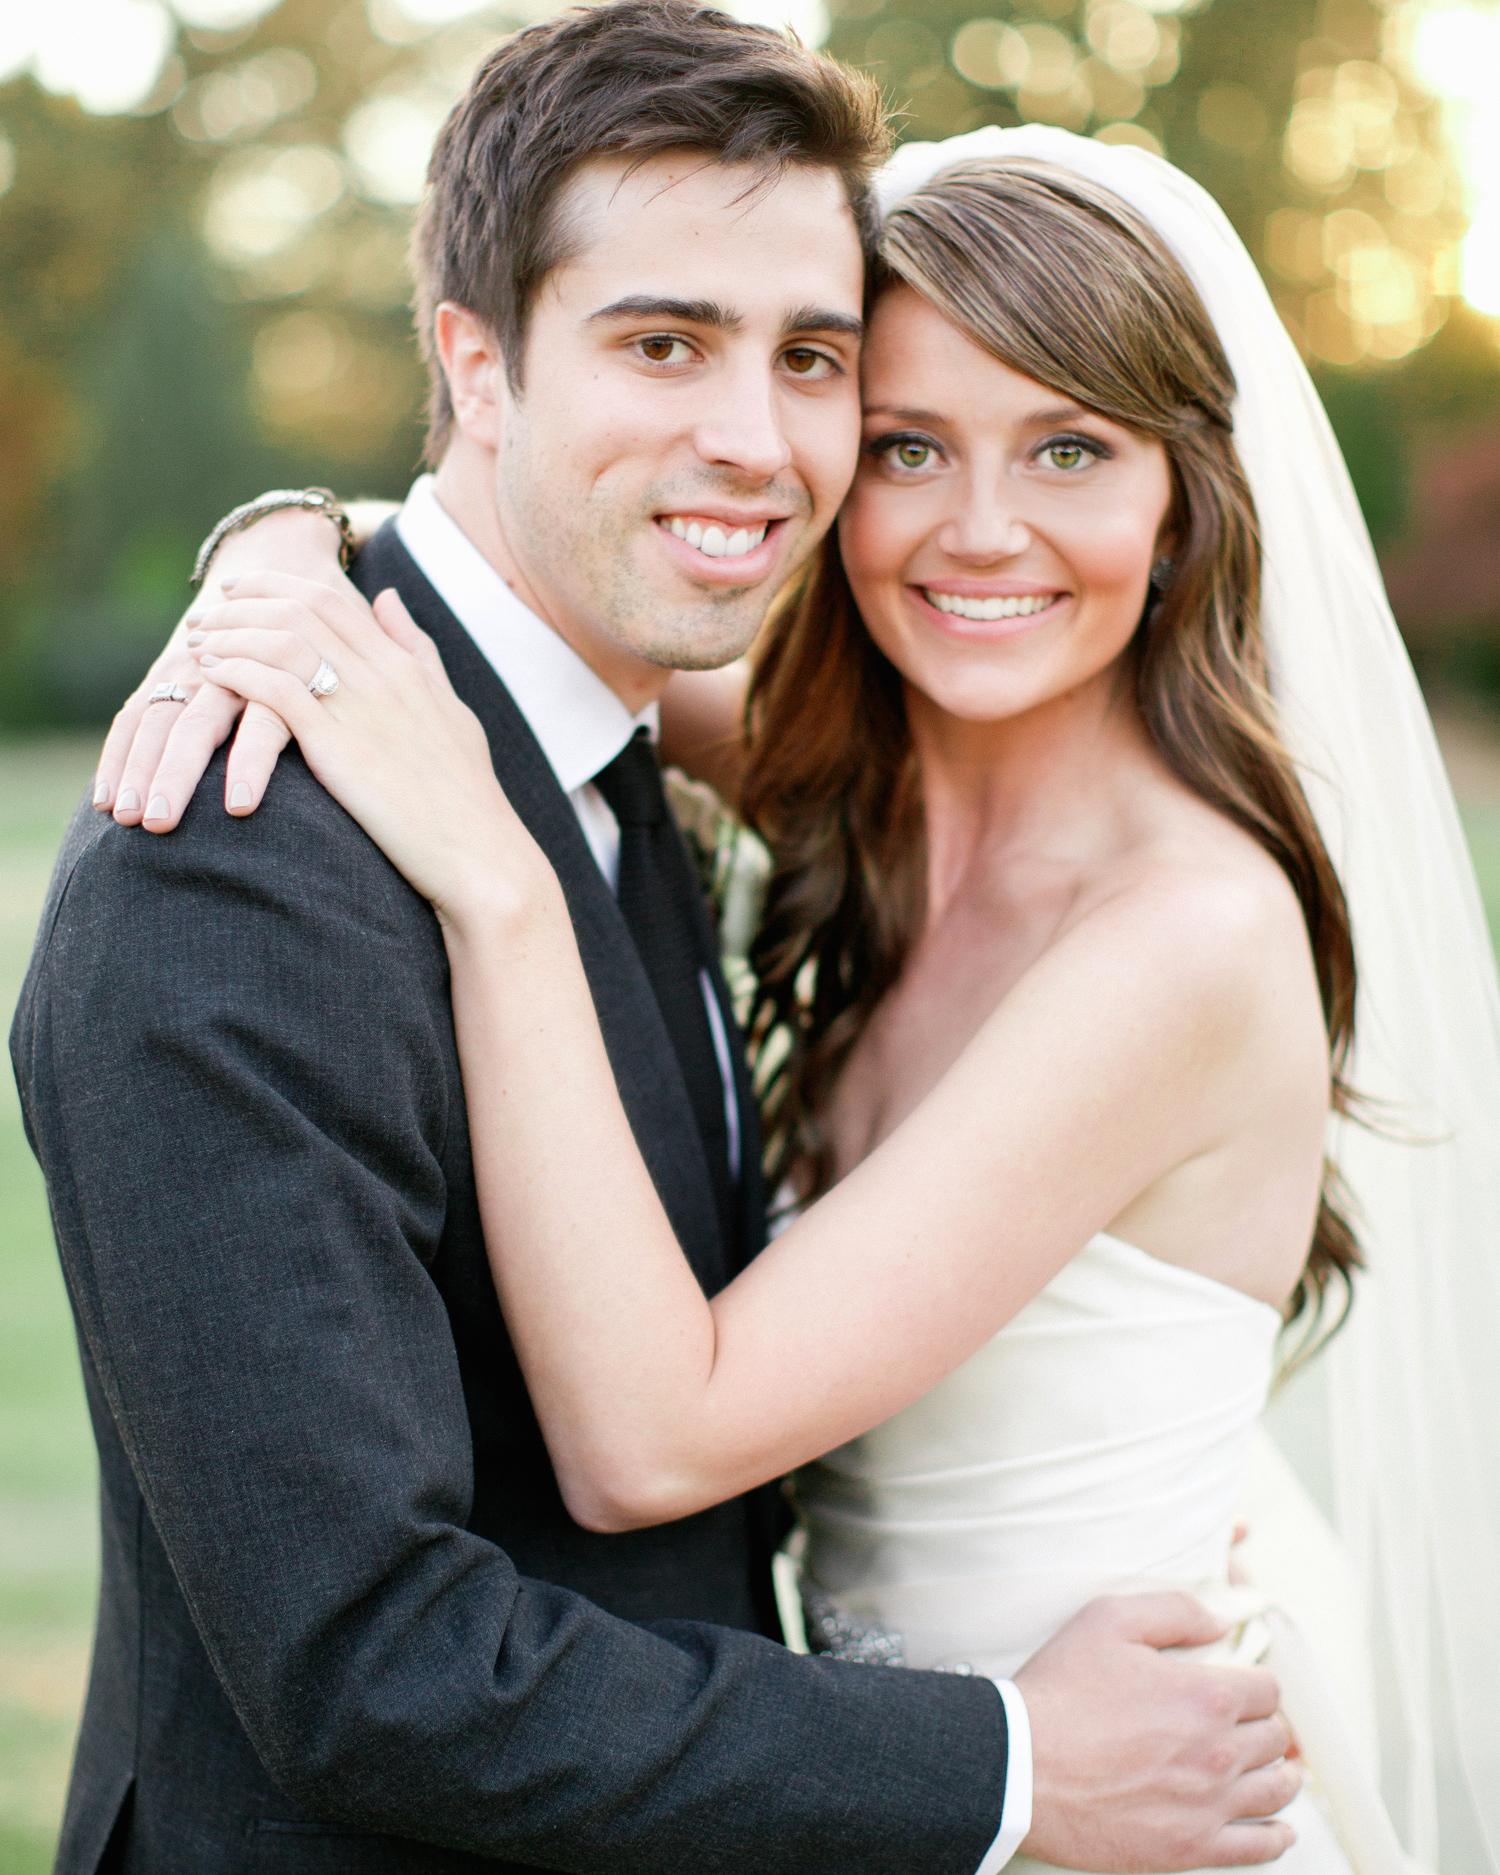 real-weddings-meredith-adam-harl4001.jpg